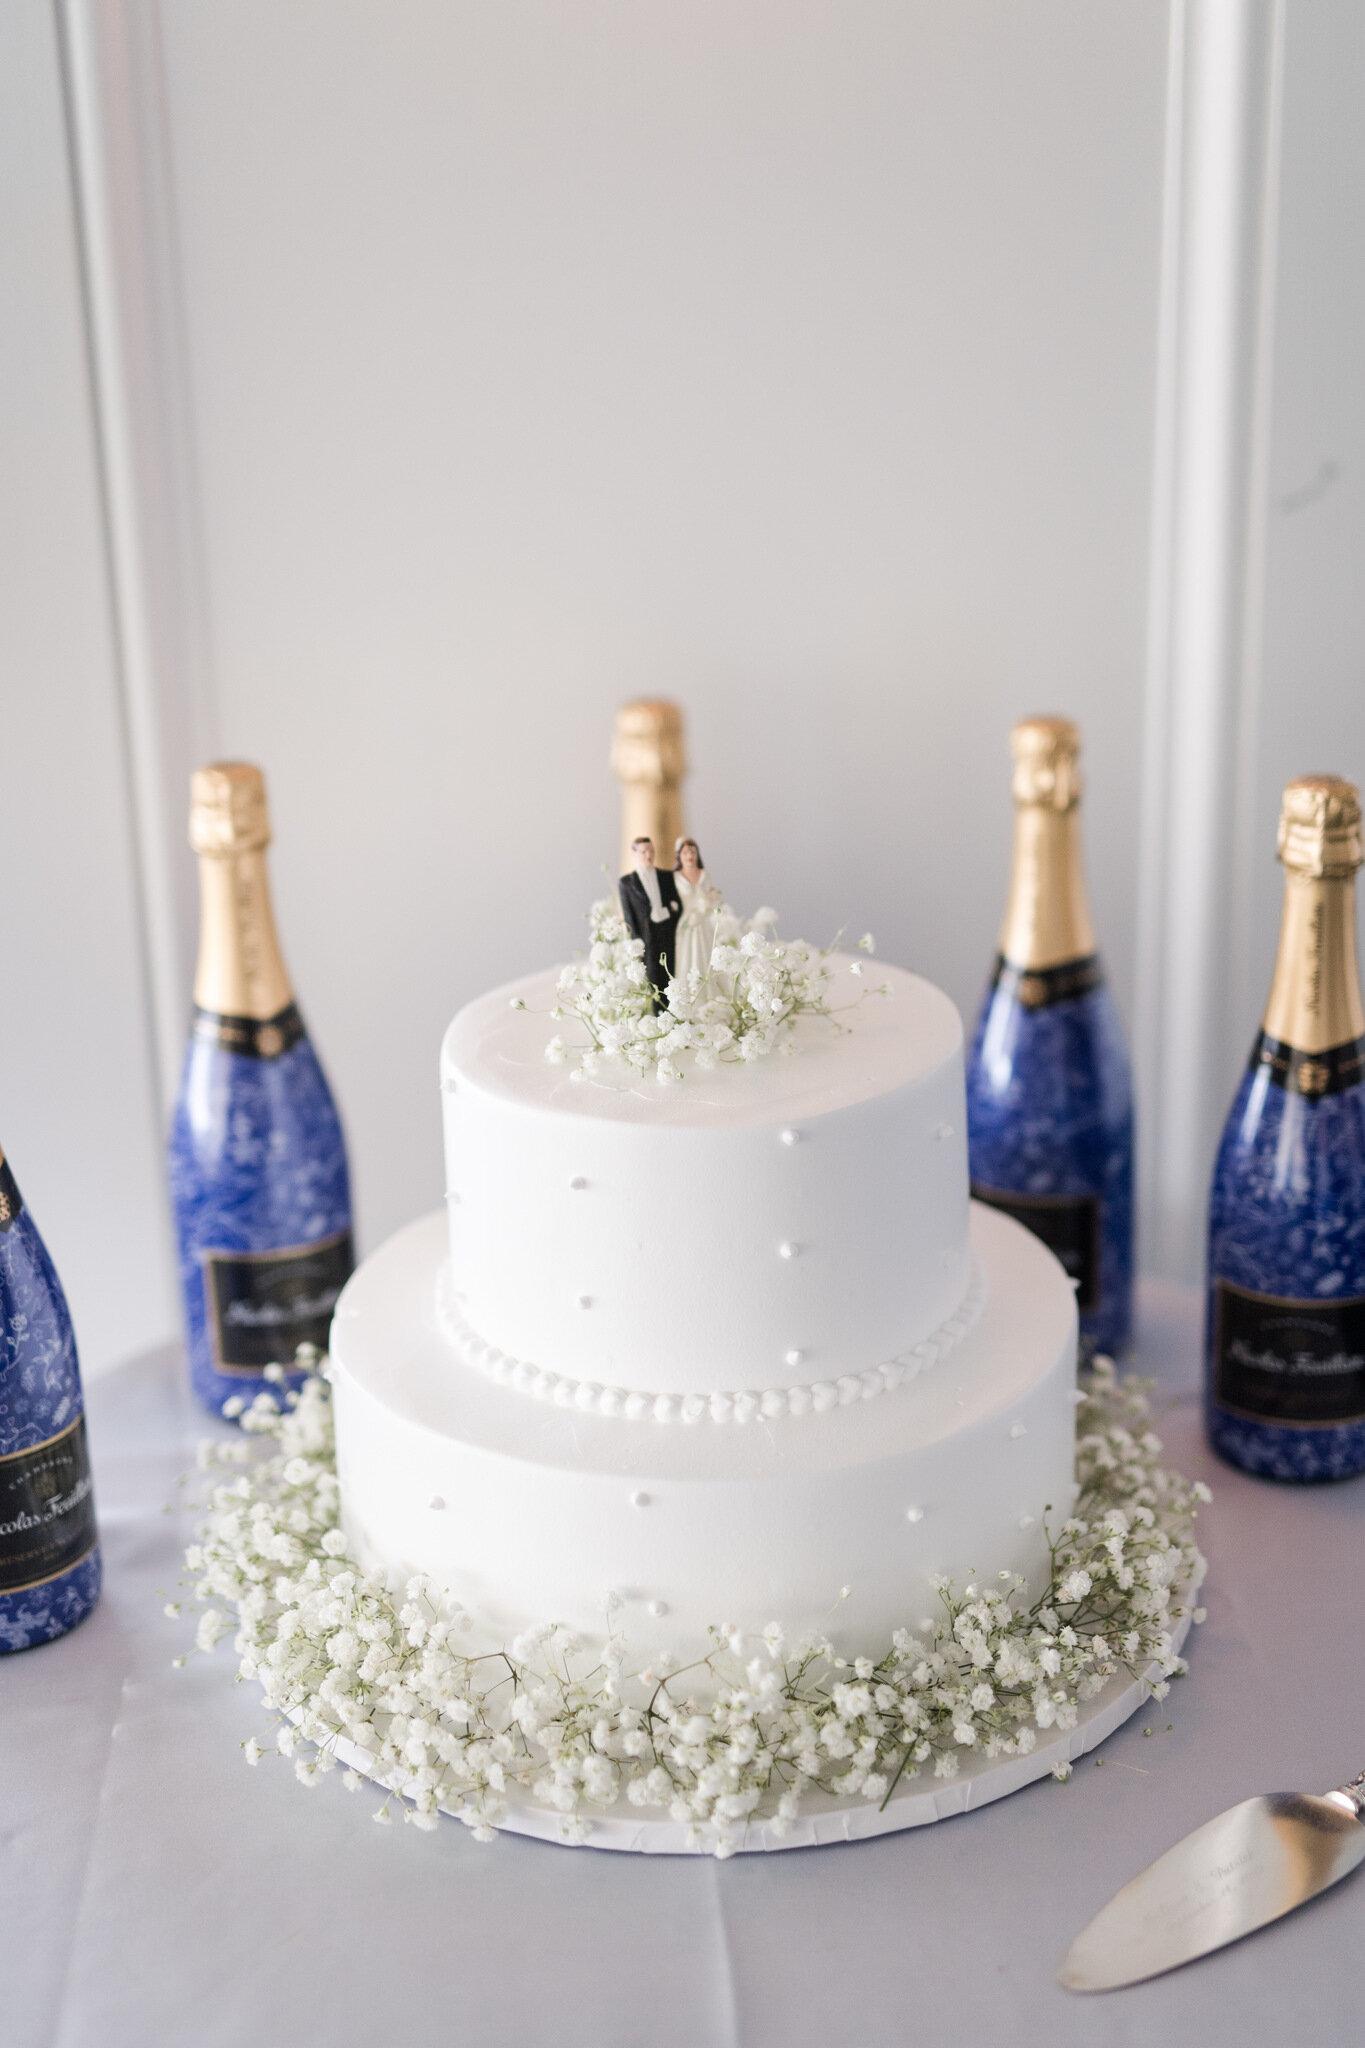 greenwich wedding_belle haven club wedding _ct wedding photographer-31_Easy-Resize.com.jpg